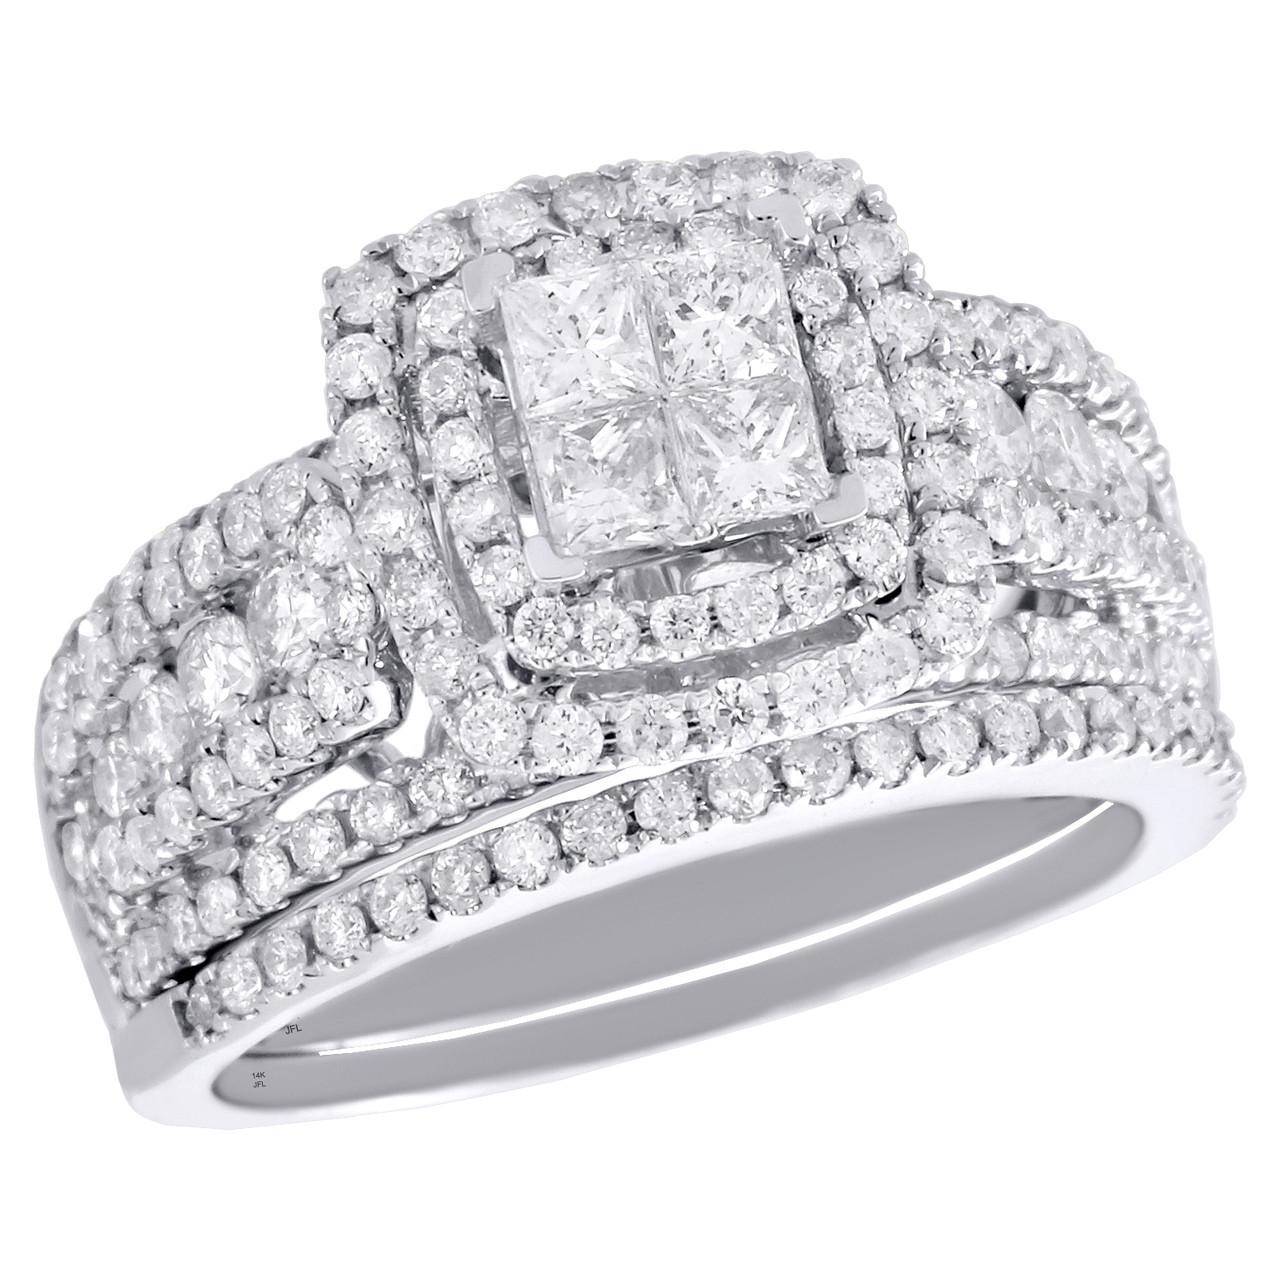 f2710a62fbf63 14K White Gold Princess Diamond Bridal Set Engagement + Wedding Rings 1.75  CT.